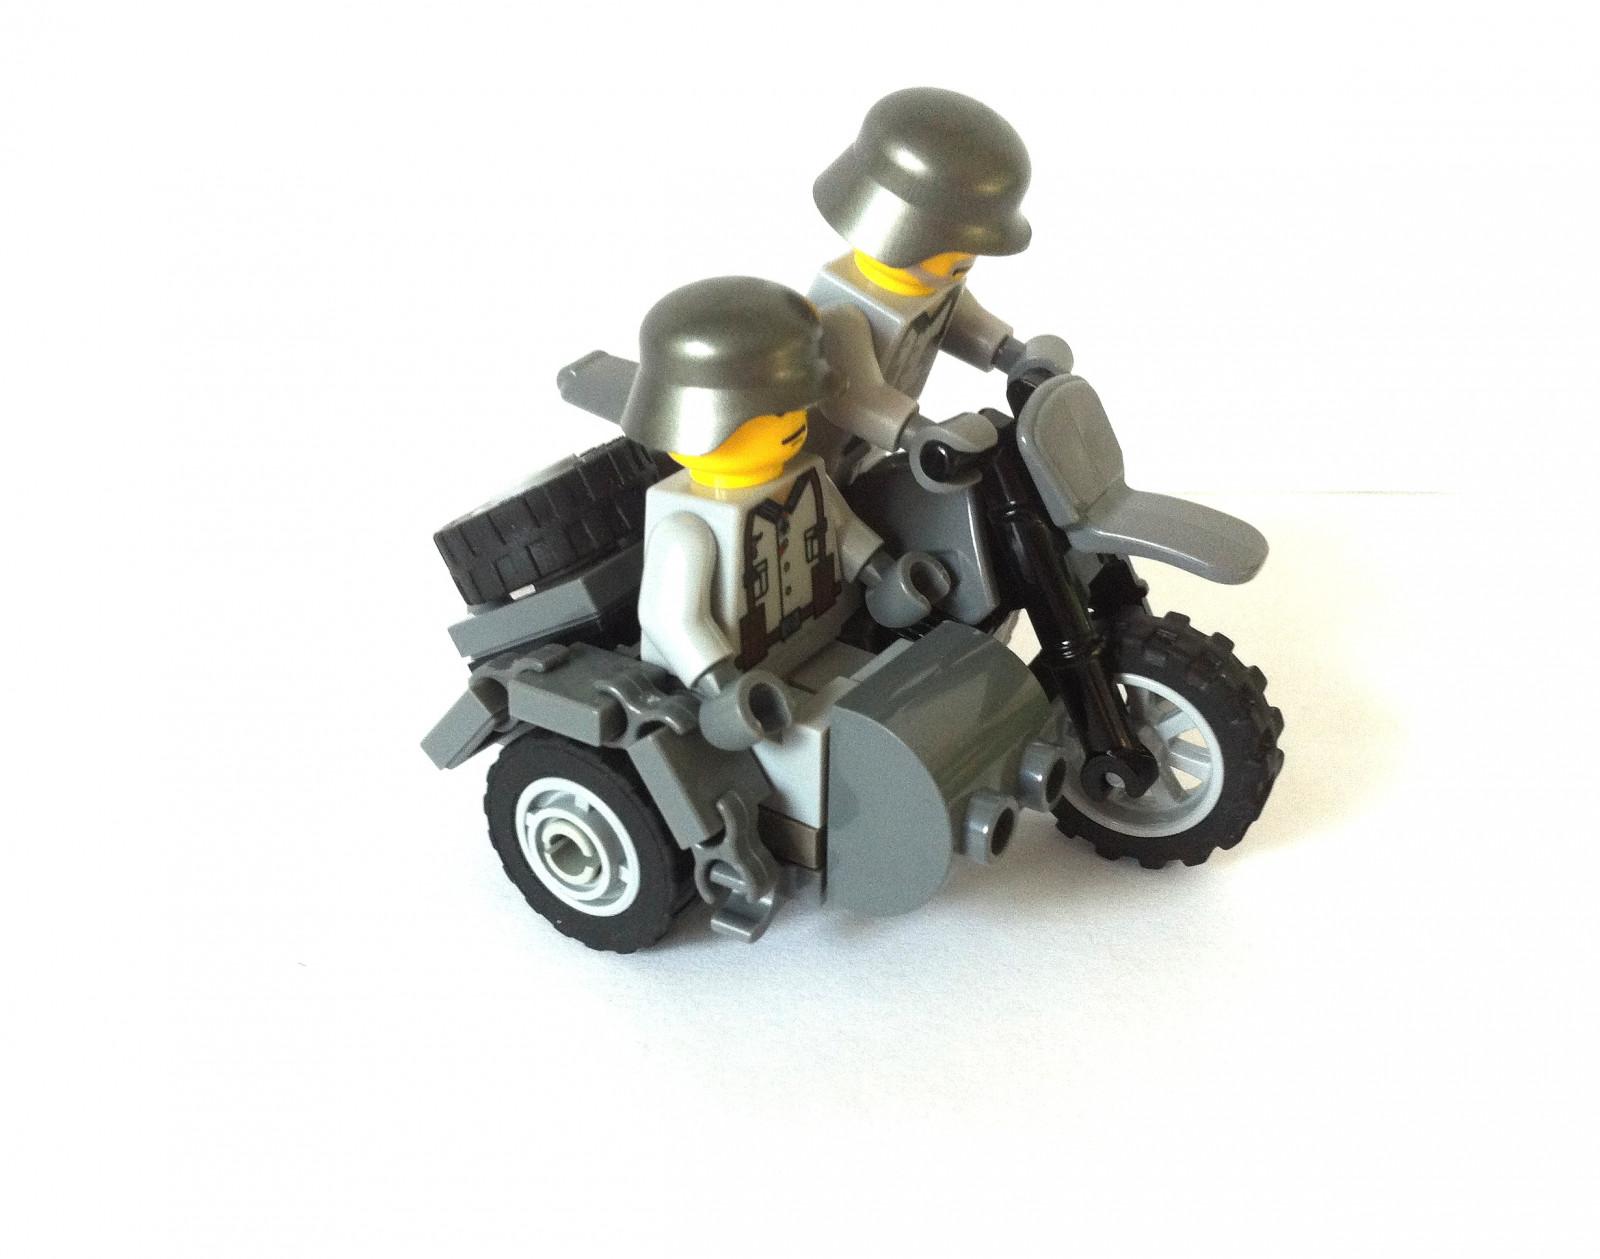 Wallpaper : motorcycle, war, LEGO, armor, world, Toy, Mod, custom ...